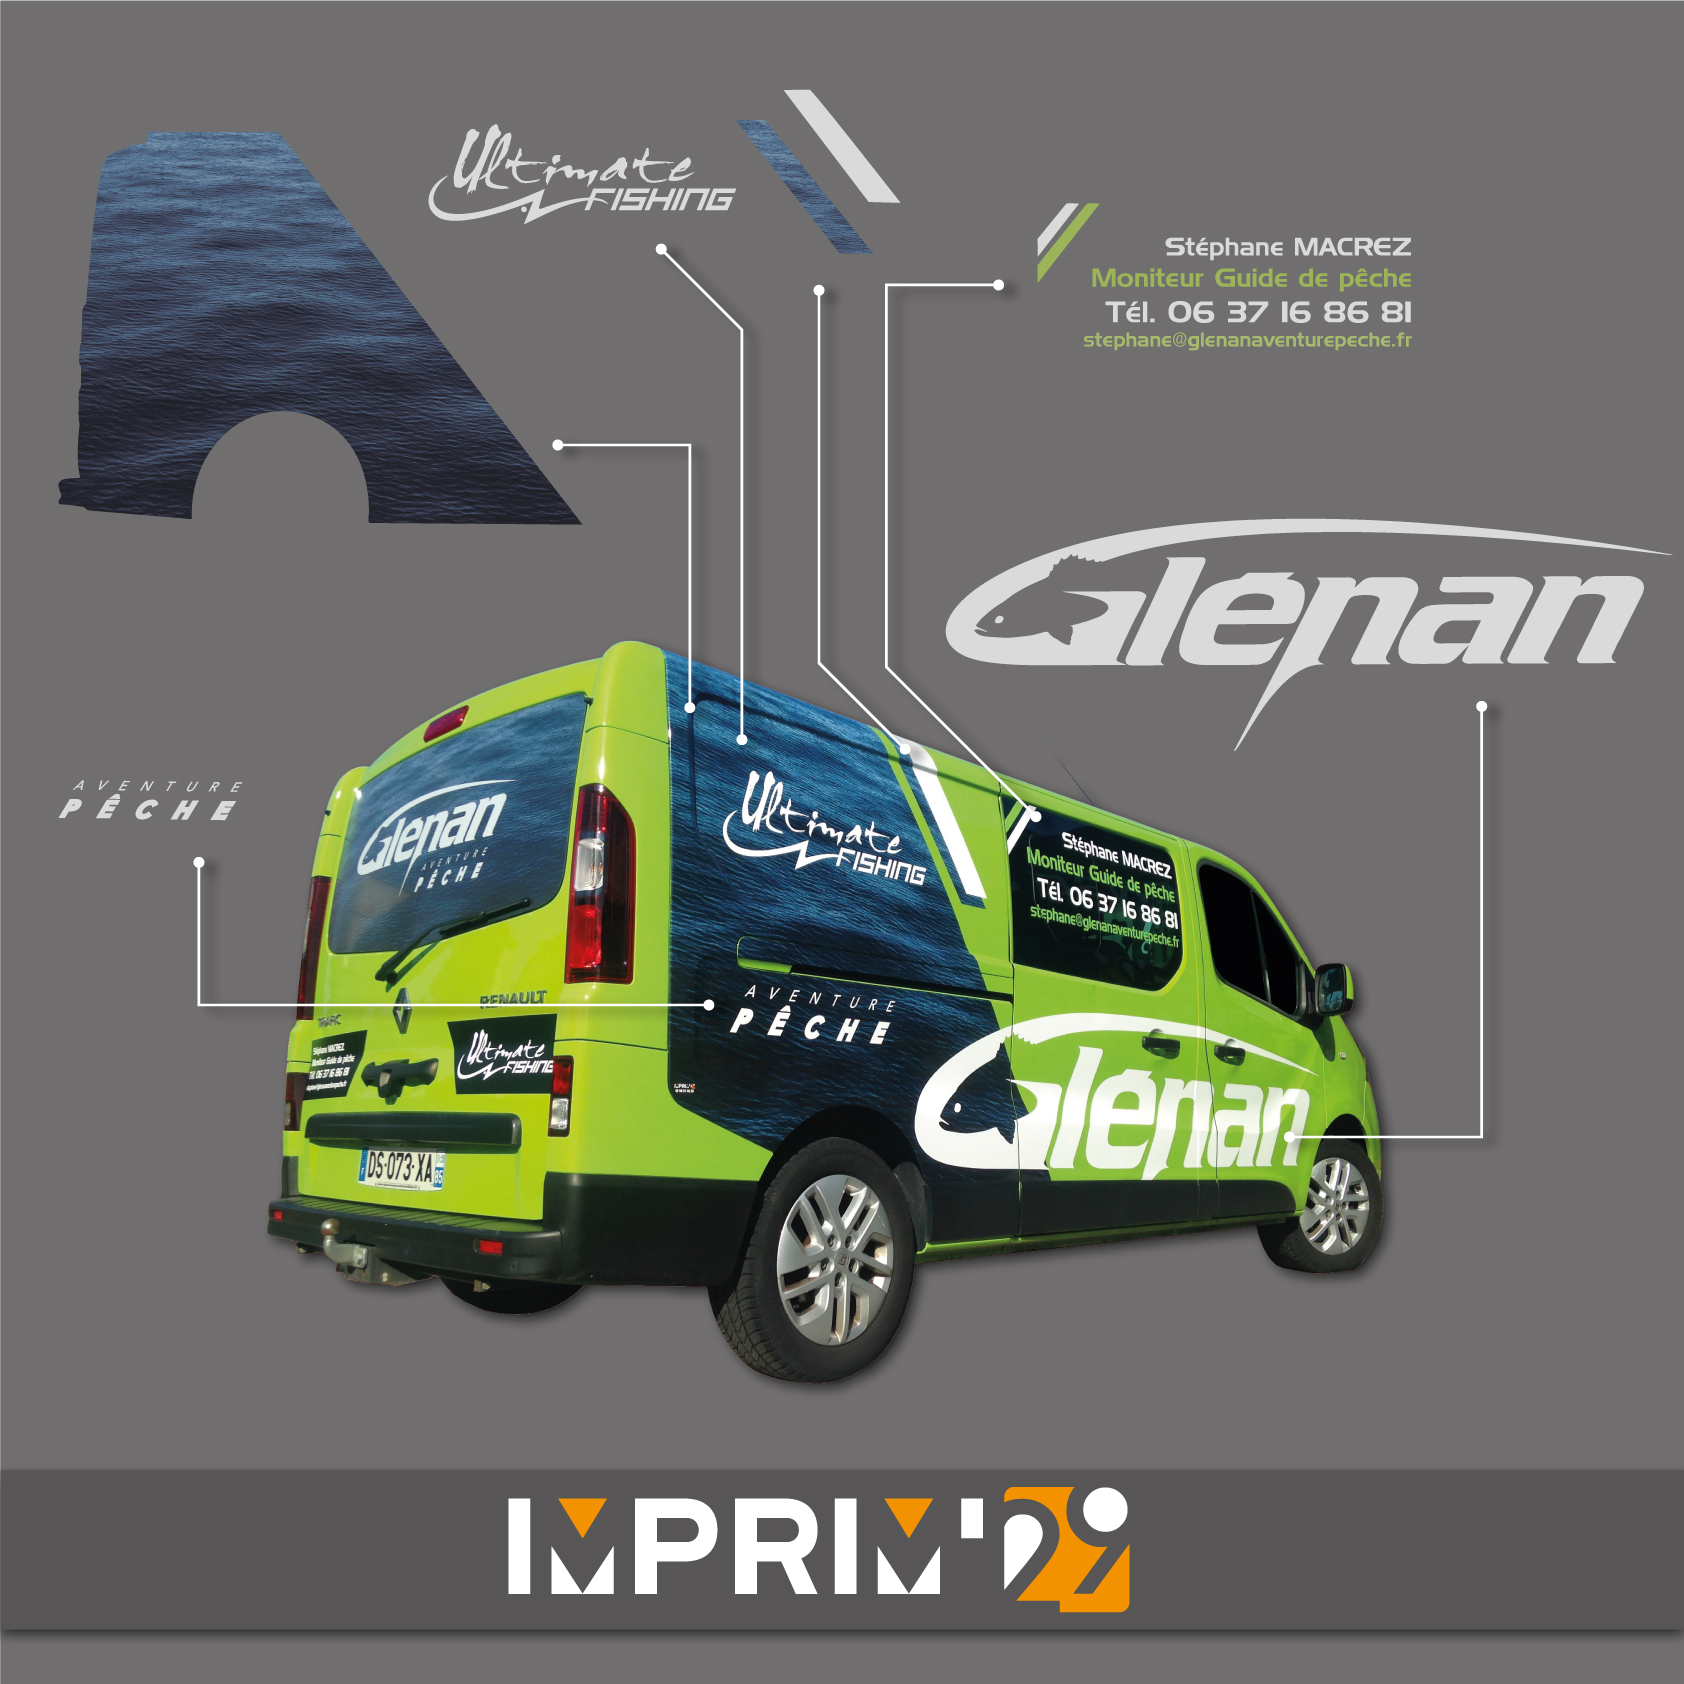 Glenan Aventure Peche - Marquage véhicule